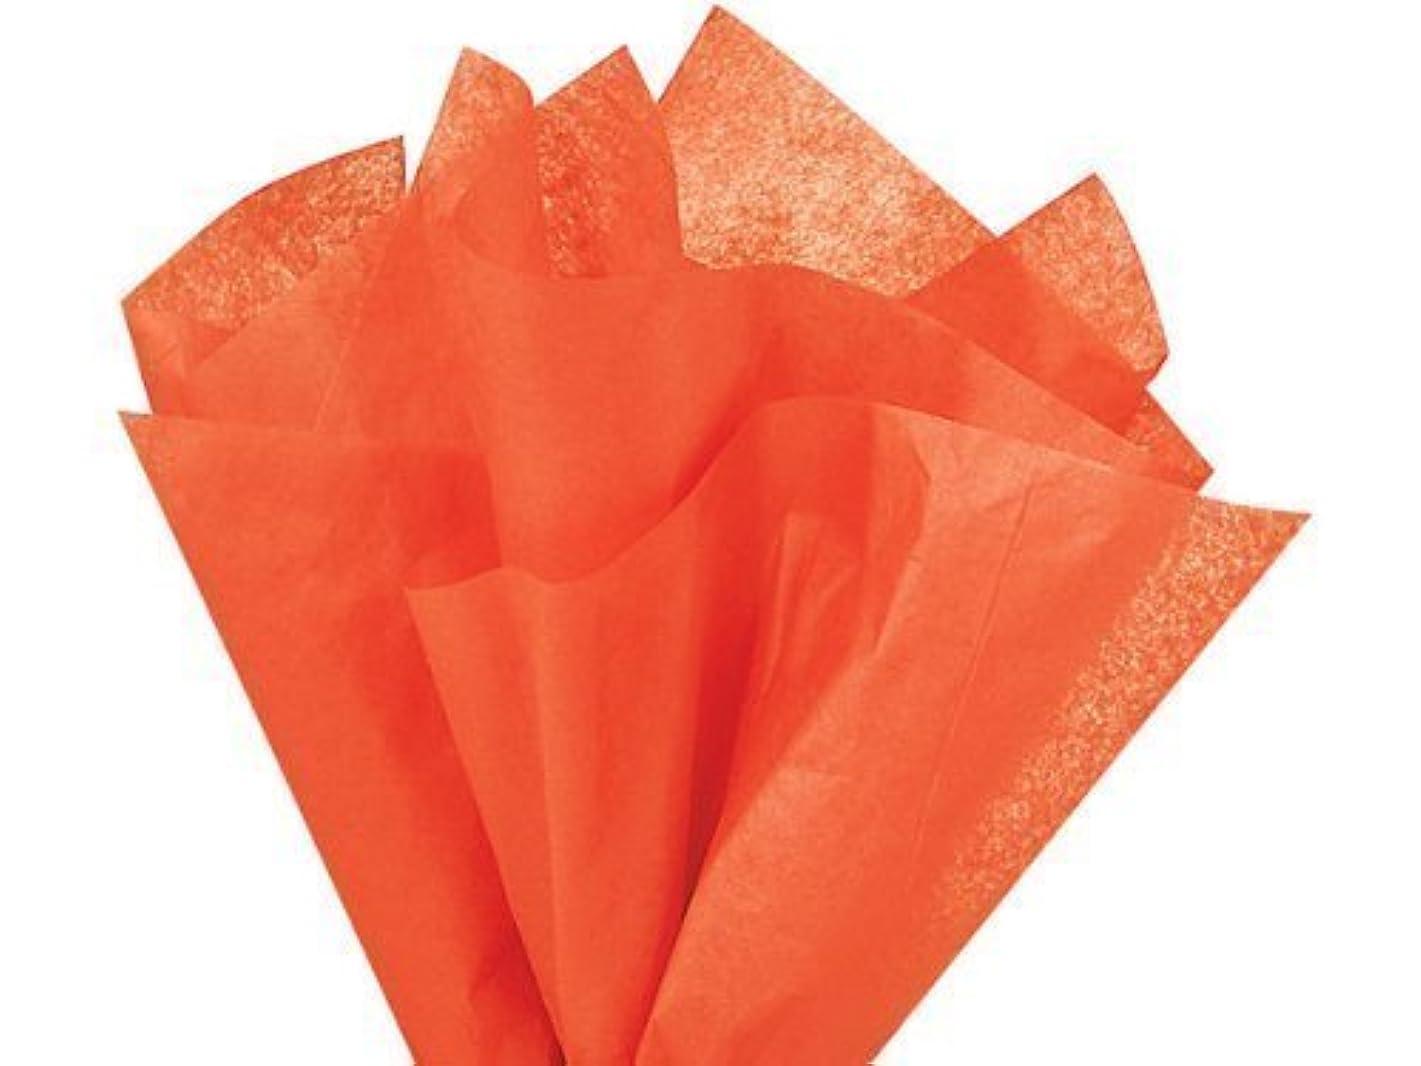 Bulk Orange Tissue Paper 20 Inch x 30 Inch - 48 XL Sheets